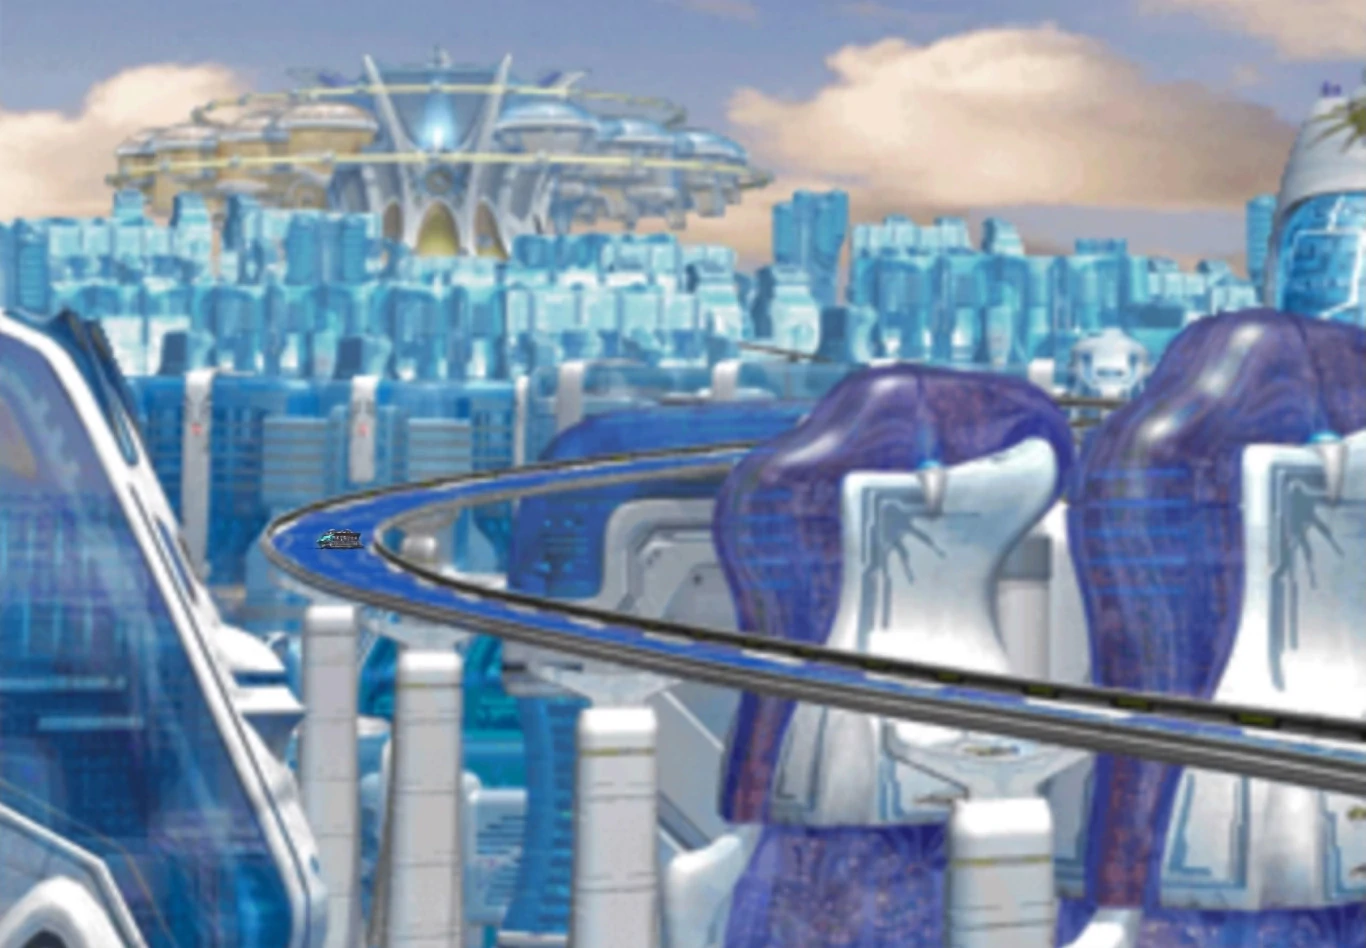 FFVIII is not a top PS1 RPG - futuristic cityscape